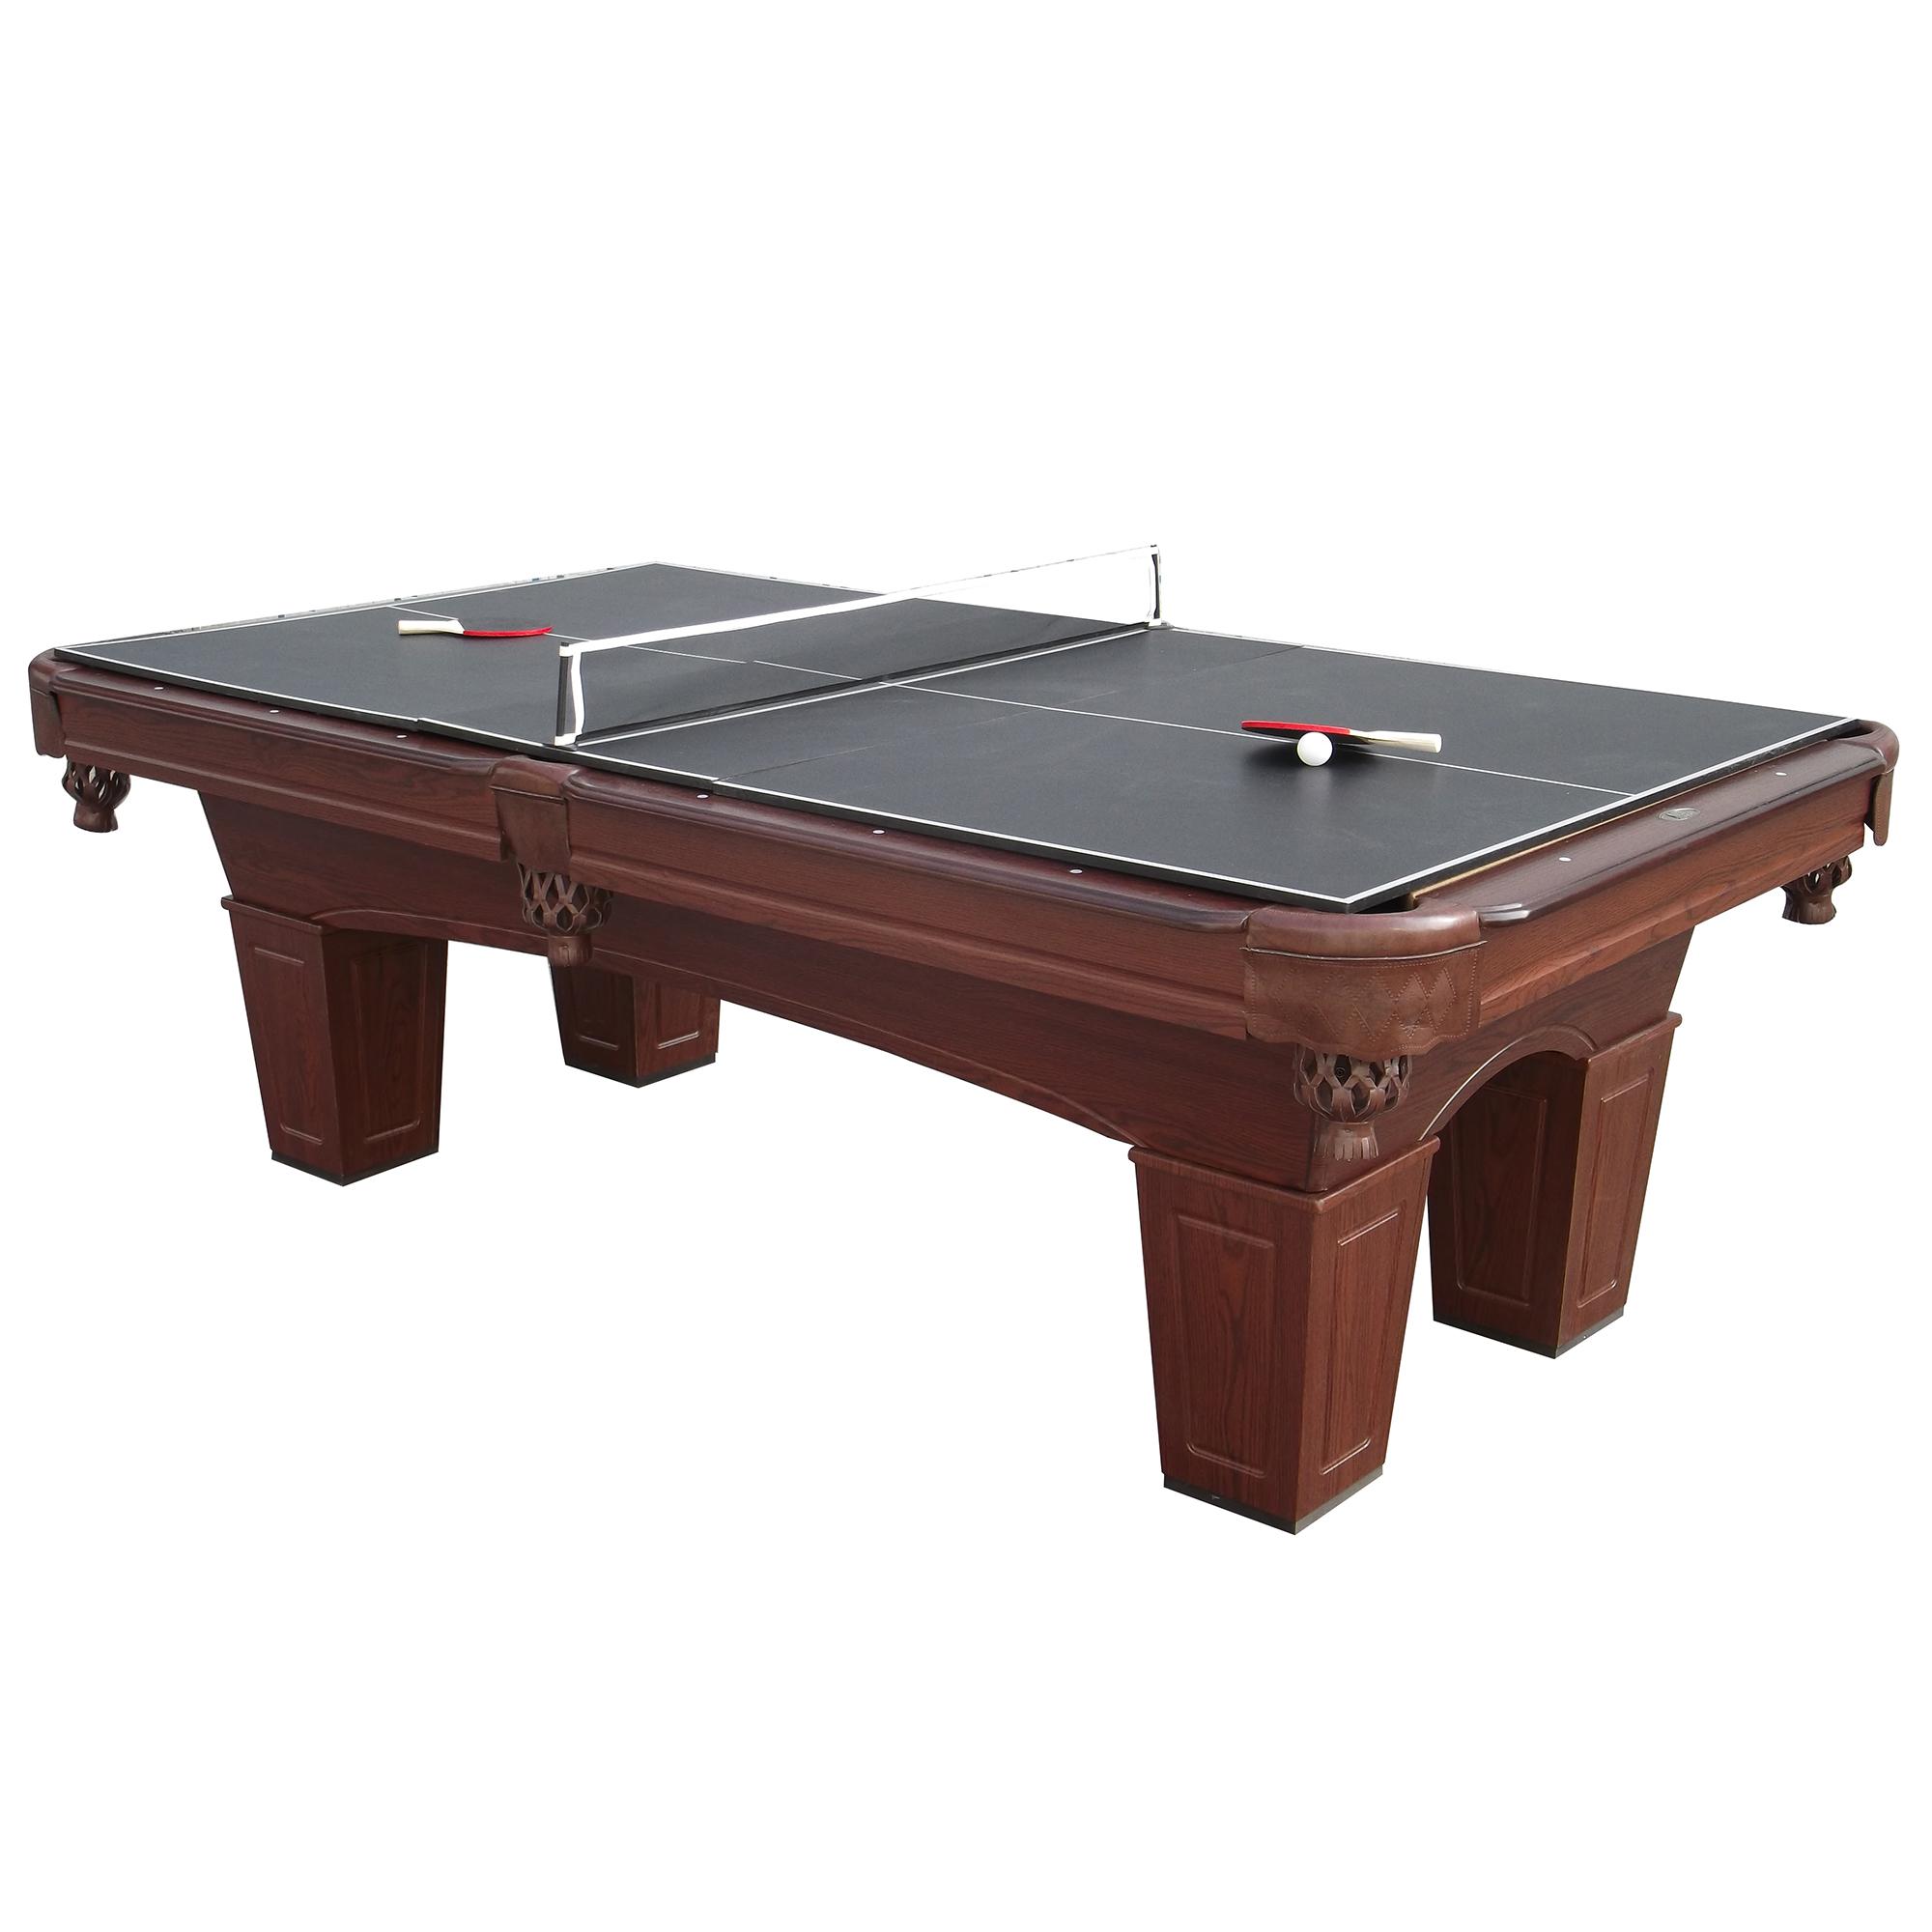 Barrington 8 39 square leg billiard pool table table tennis top w accessories ebay - Pool table table tennis ...